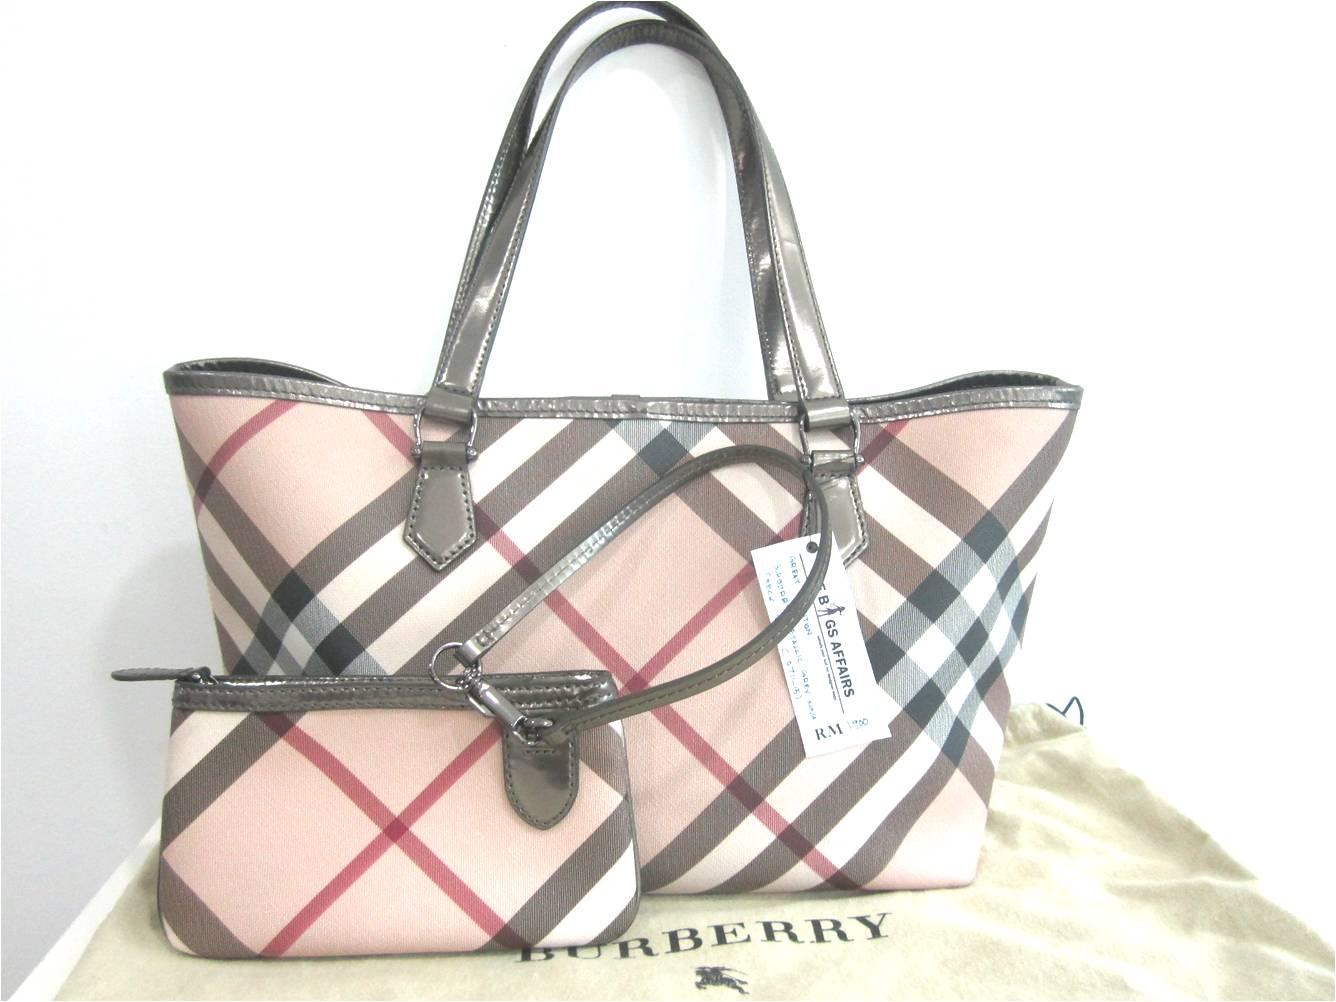 The bags affairs satisfy your lust for designer bags burberry jpg 1336x1002 Burberry  metallic handbag 5d41e6f6656ae